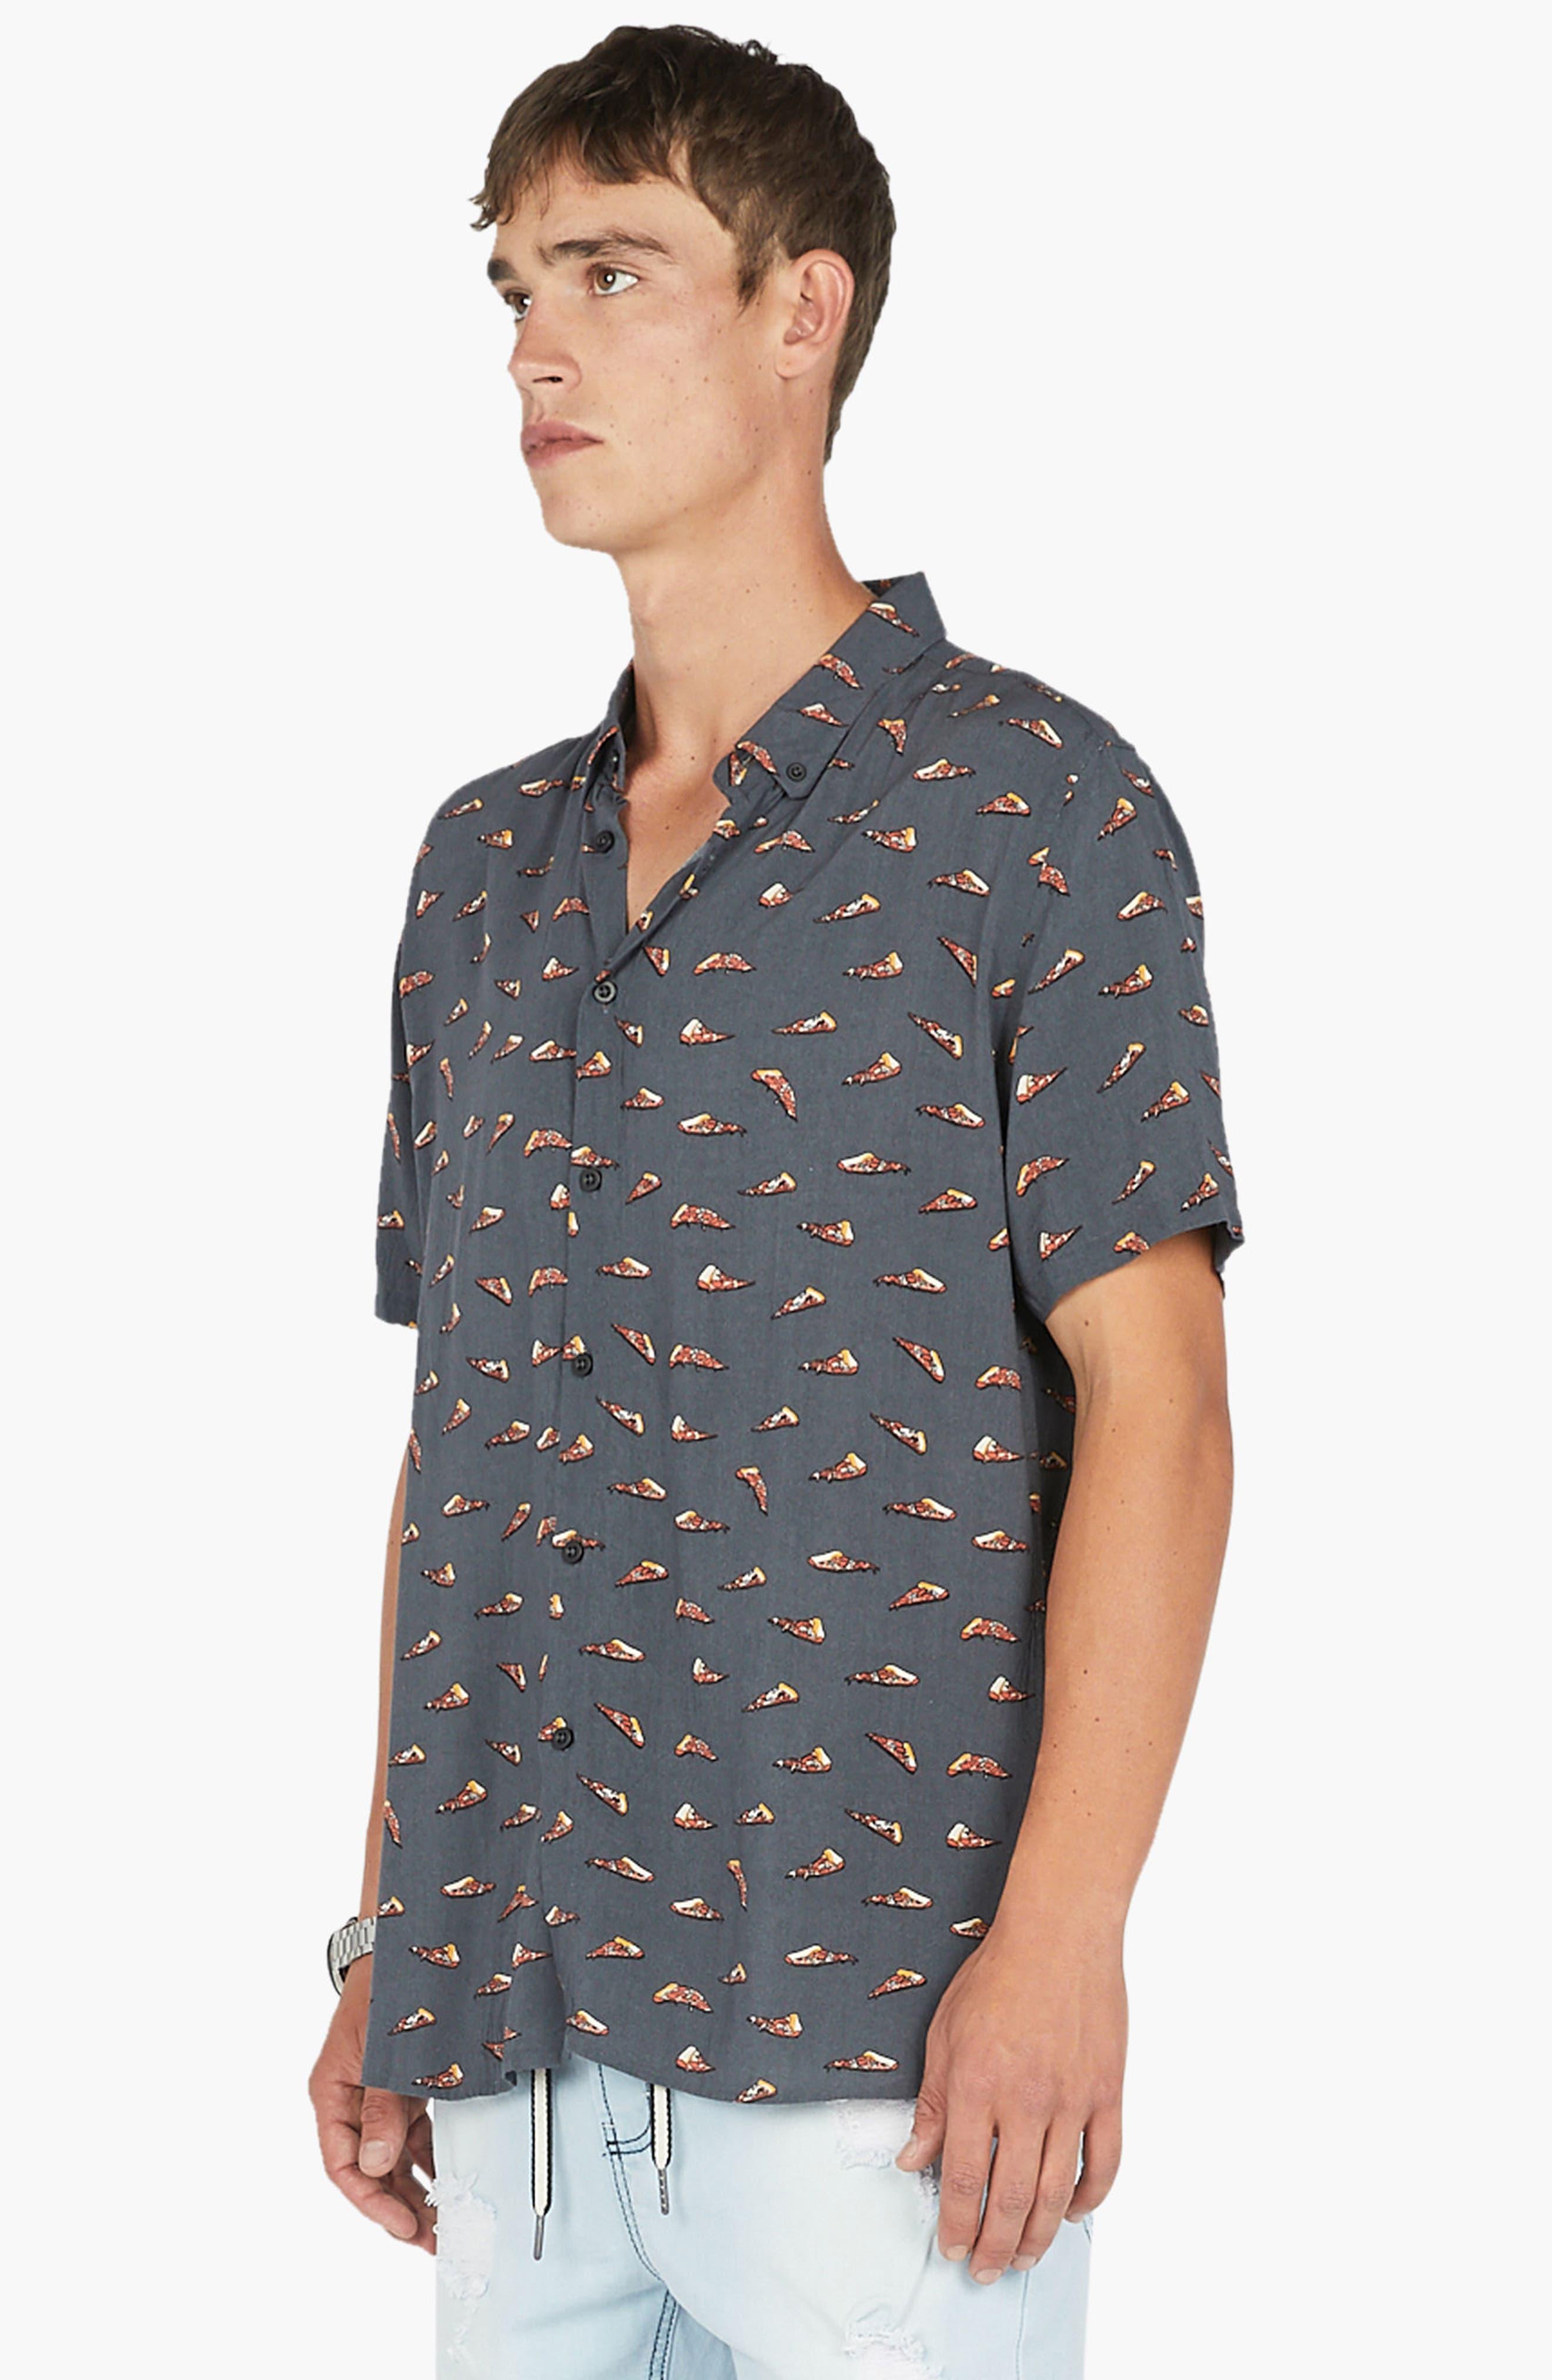 Holiday Woven Shirt,                             Alternate thumbnail 4, color,                             Black Pizza